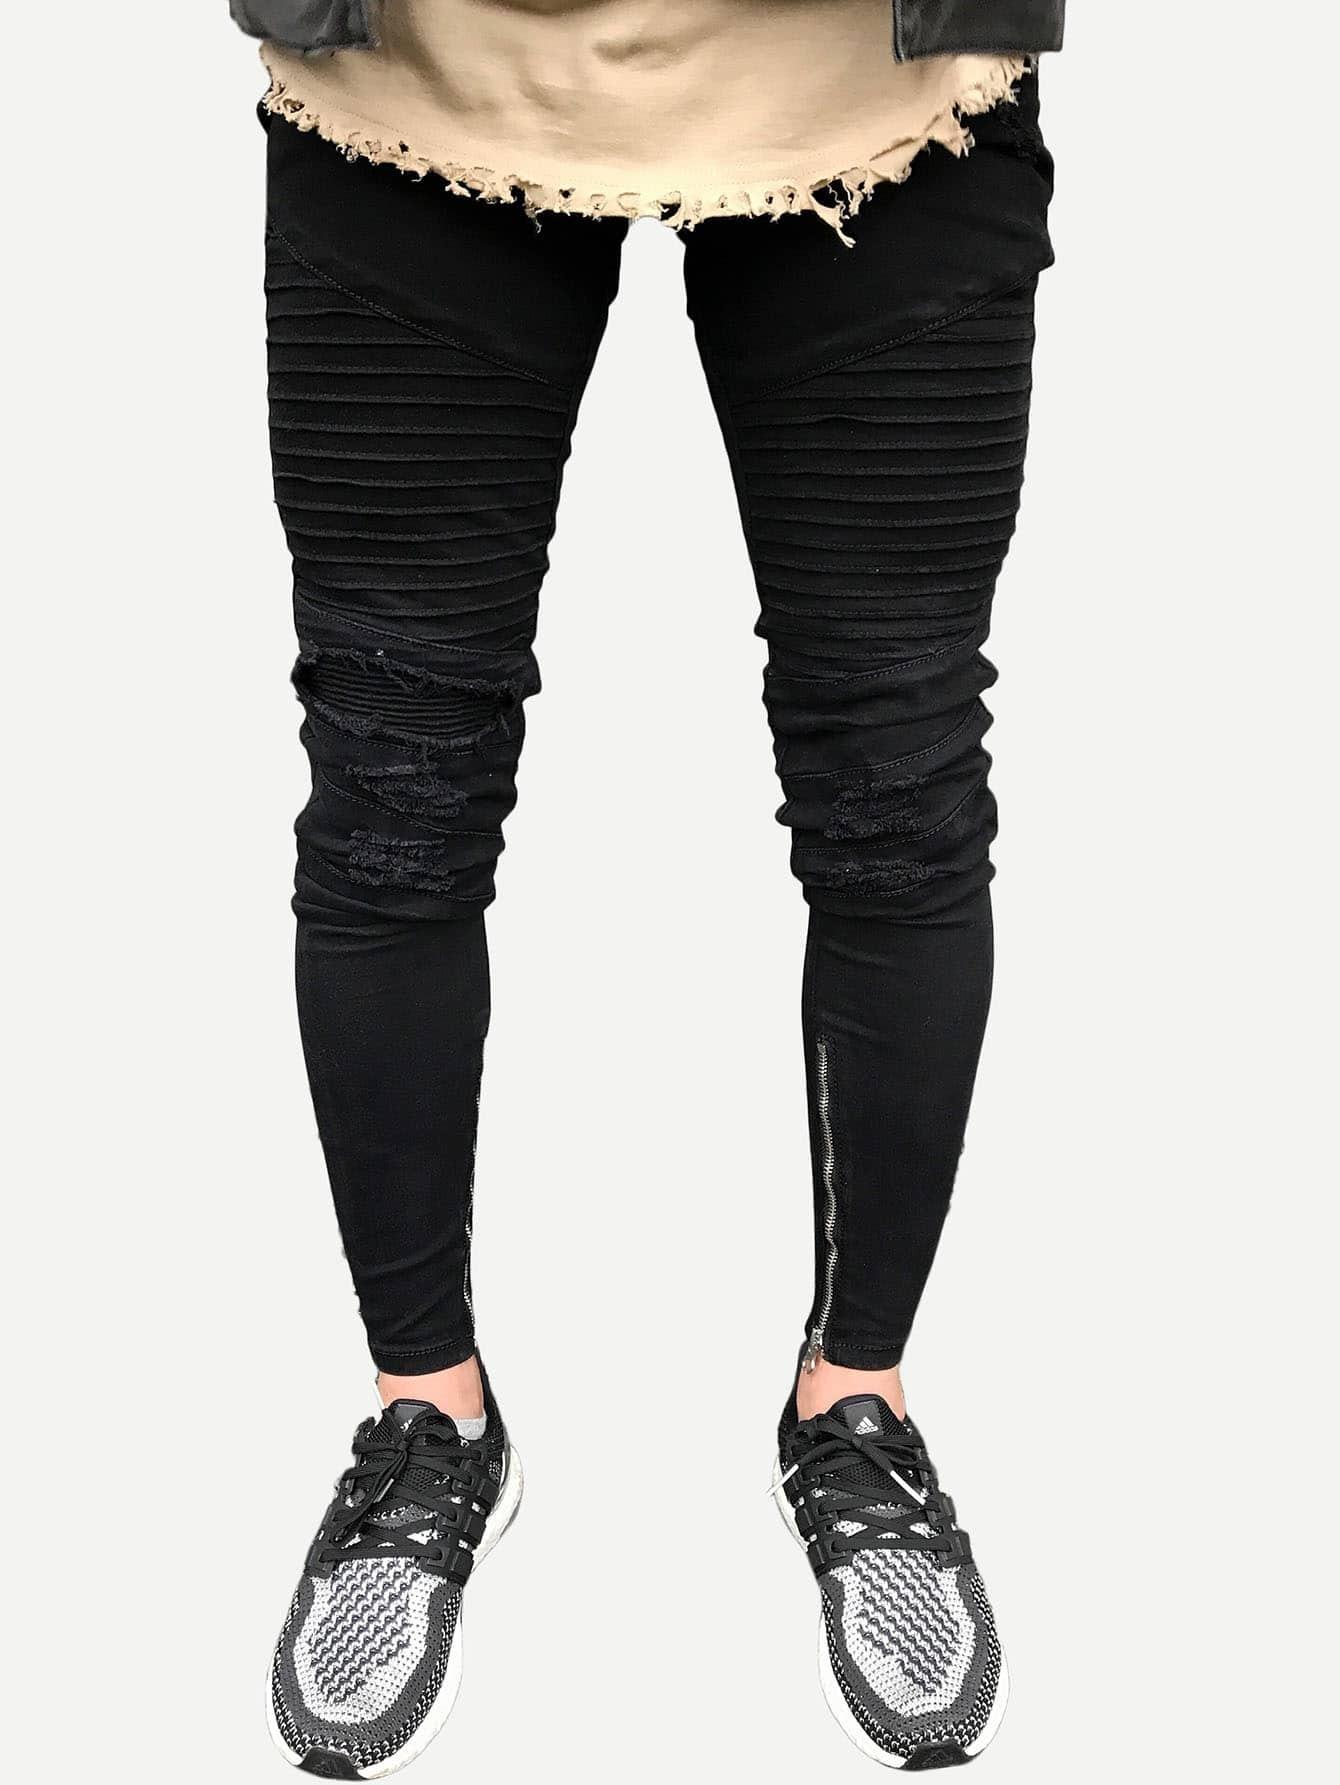 Men Zip Decoration Destroyed Skinny Jeans 2017 new men s classic jeans straight full length casual hip hop zip pocket biker jeans fashion slim skinny jeans men big sizes